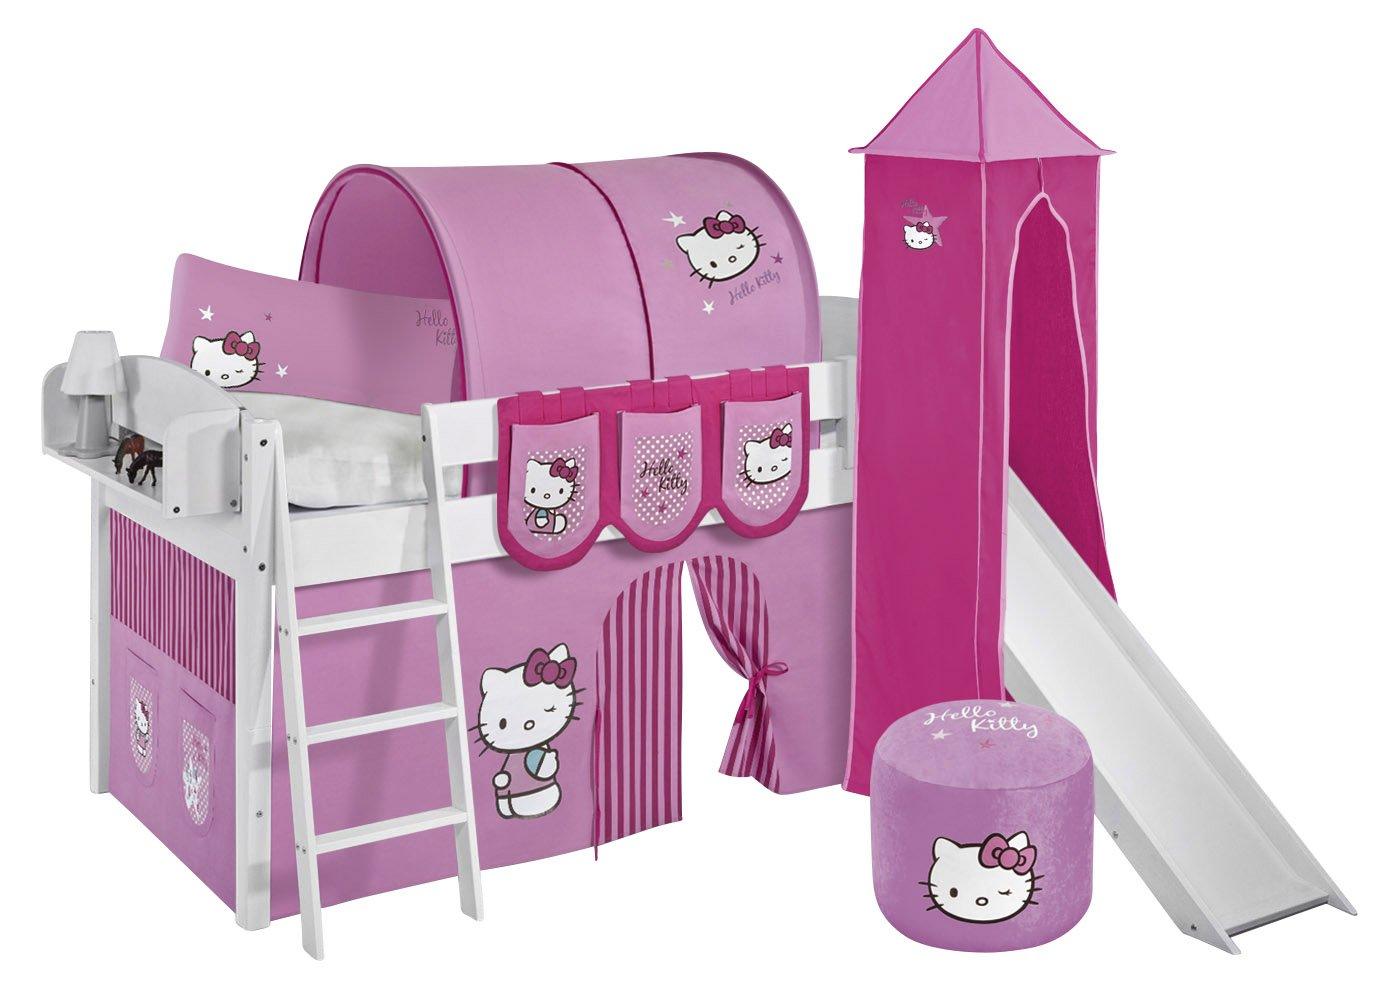 Lilokids IDA4105KWTR-HELLOKITTY-R Kinderbett, Holz, hello kittty rosa, 208 x 220 x 185 cm